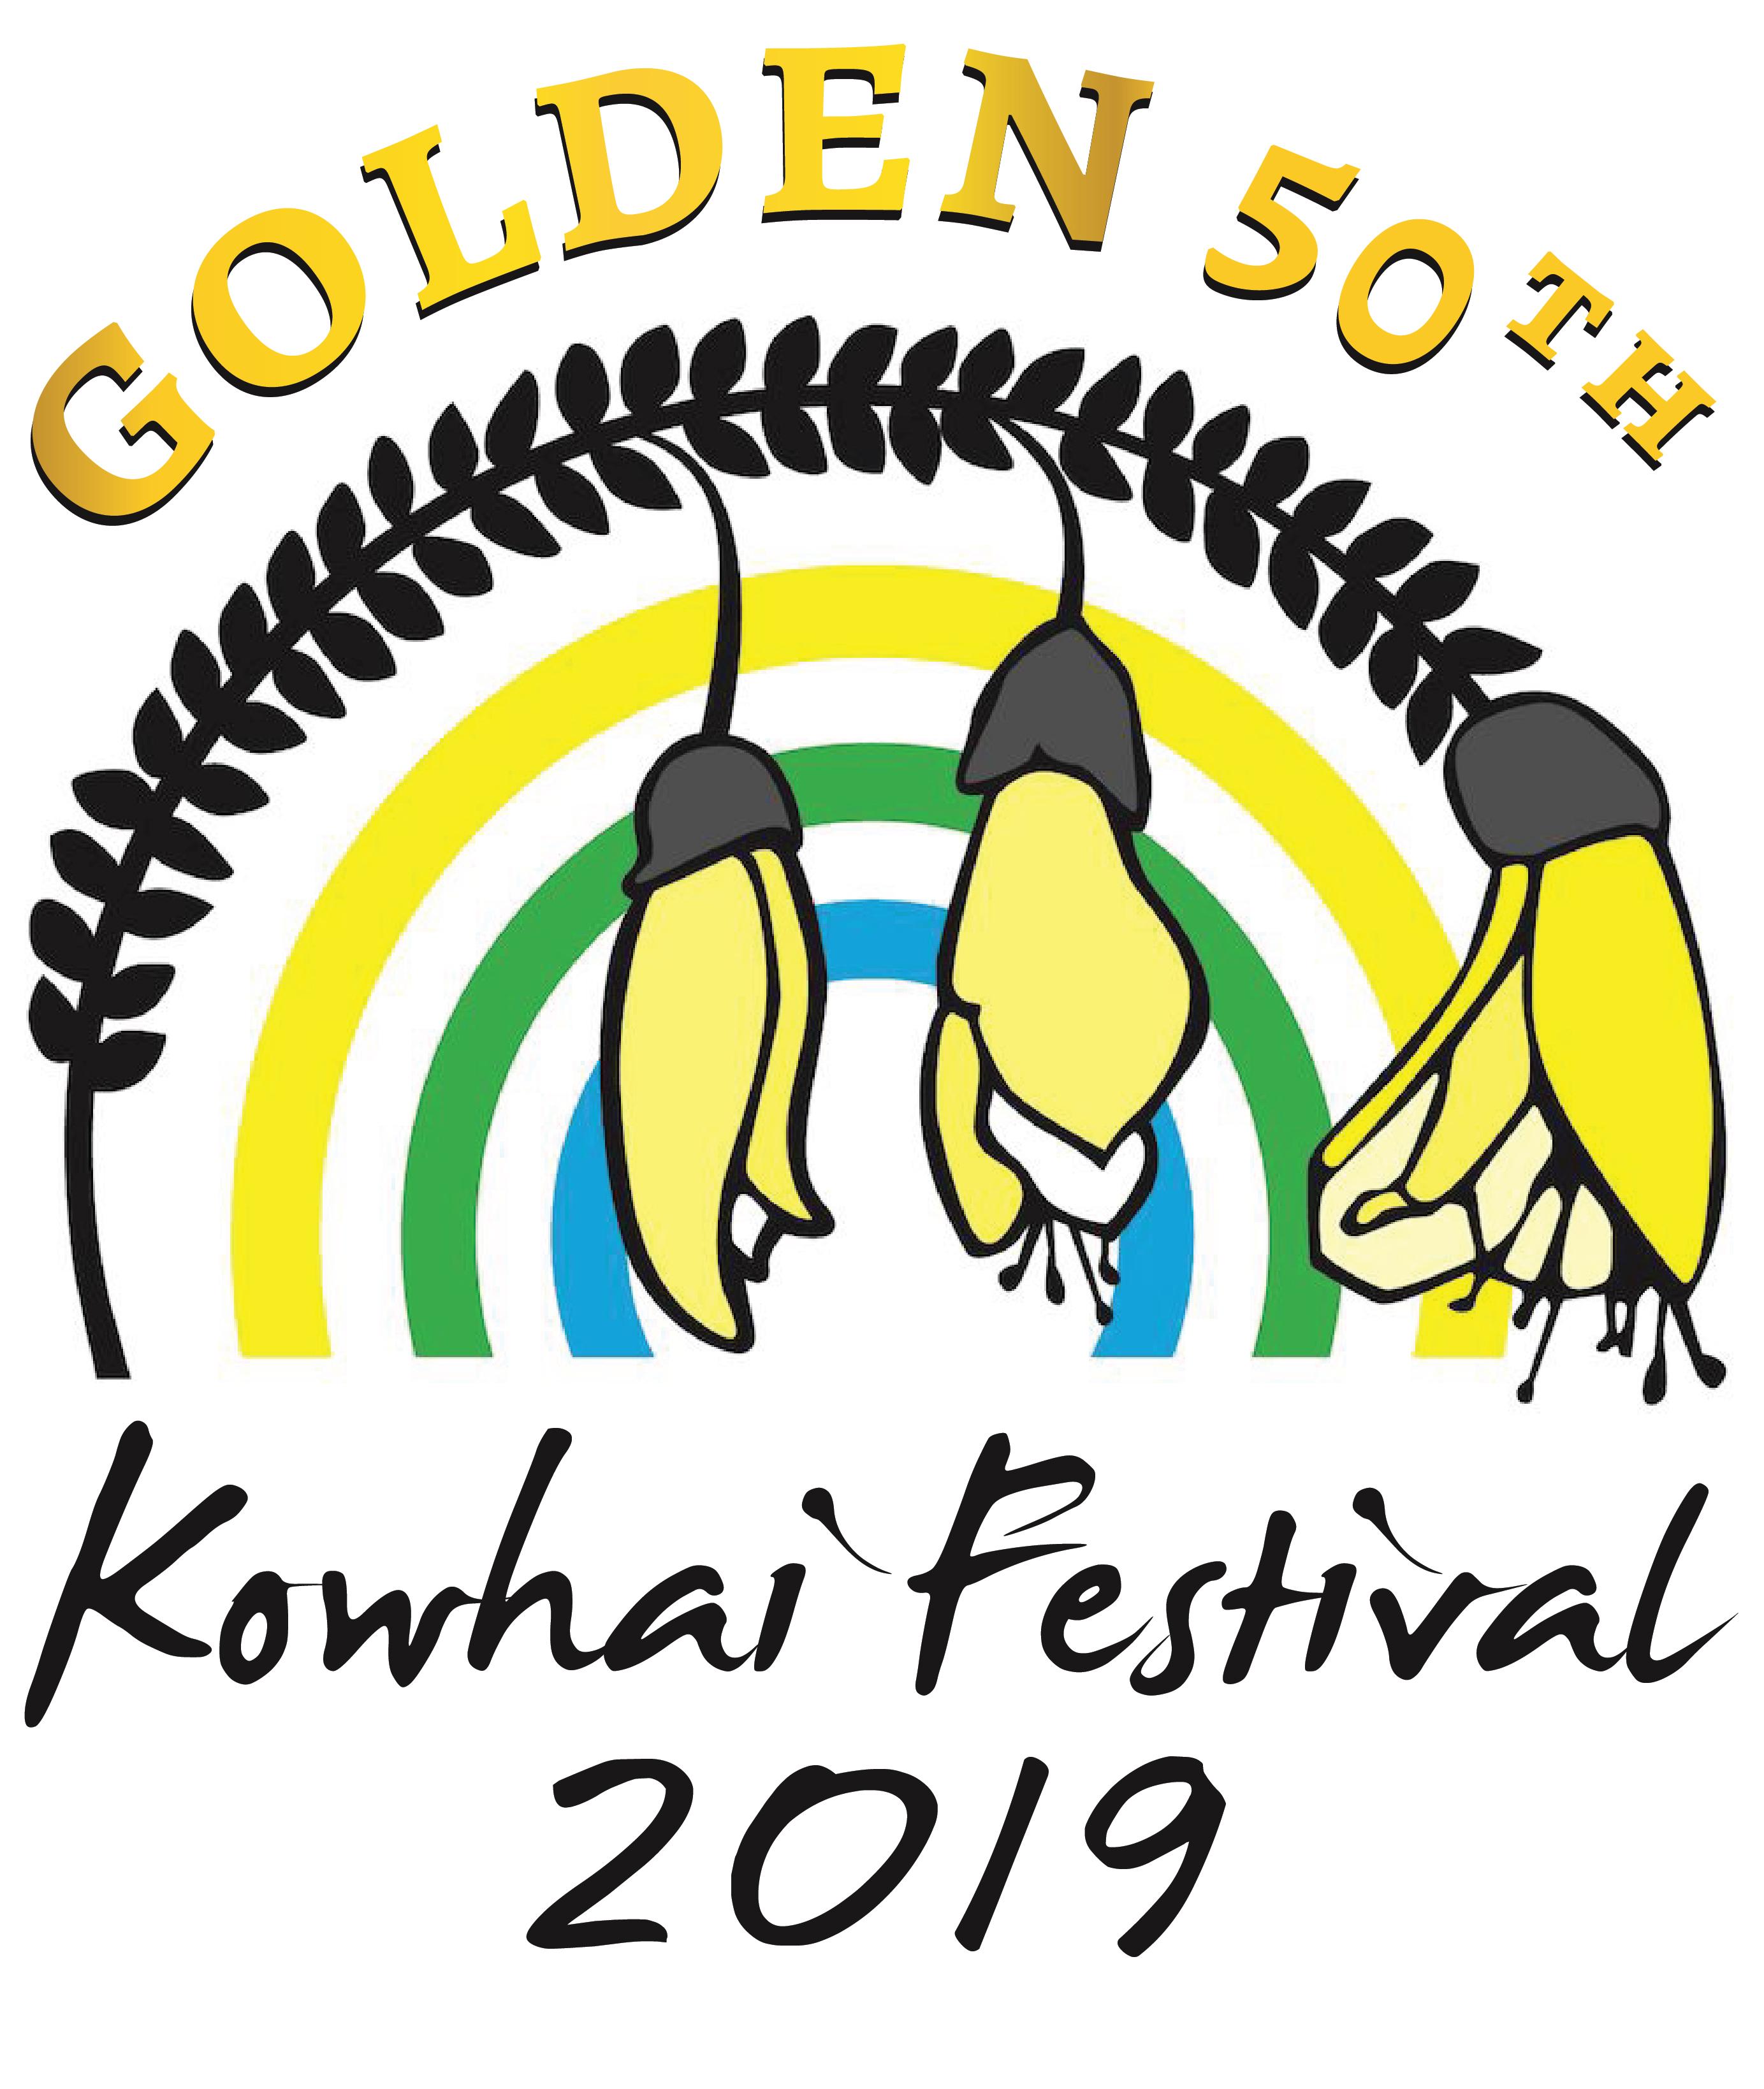 Kowhai Festival image